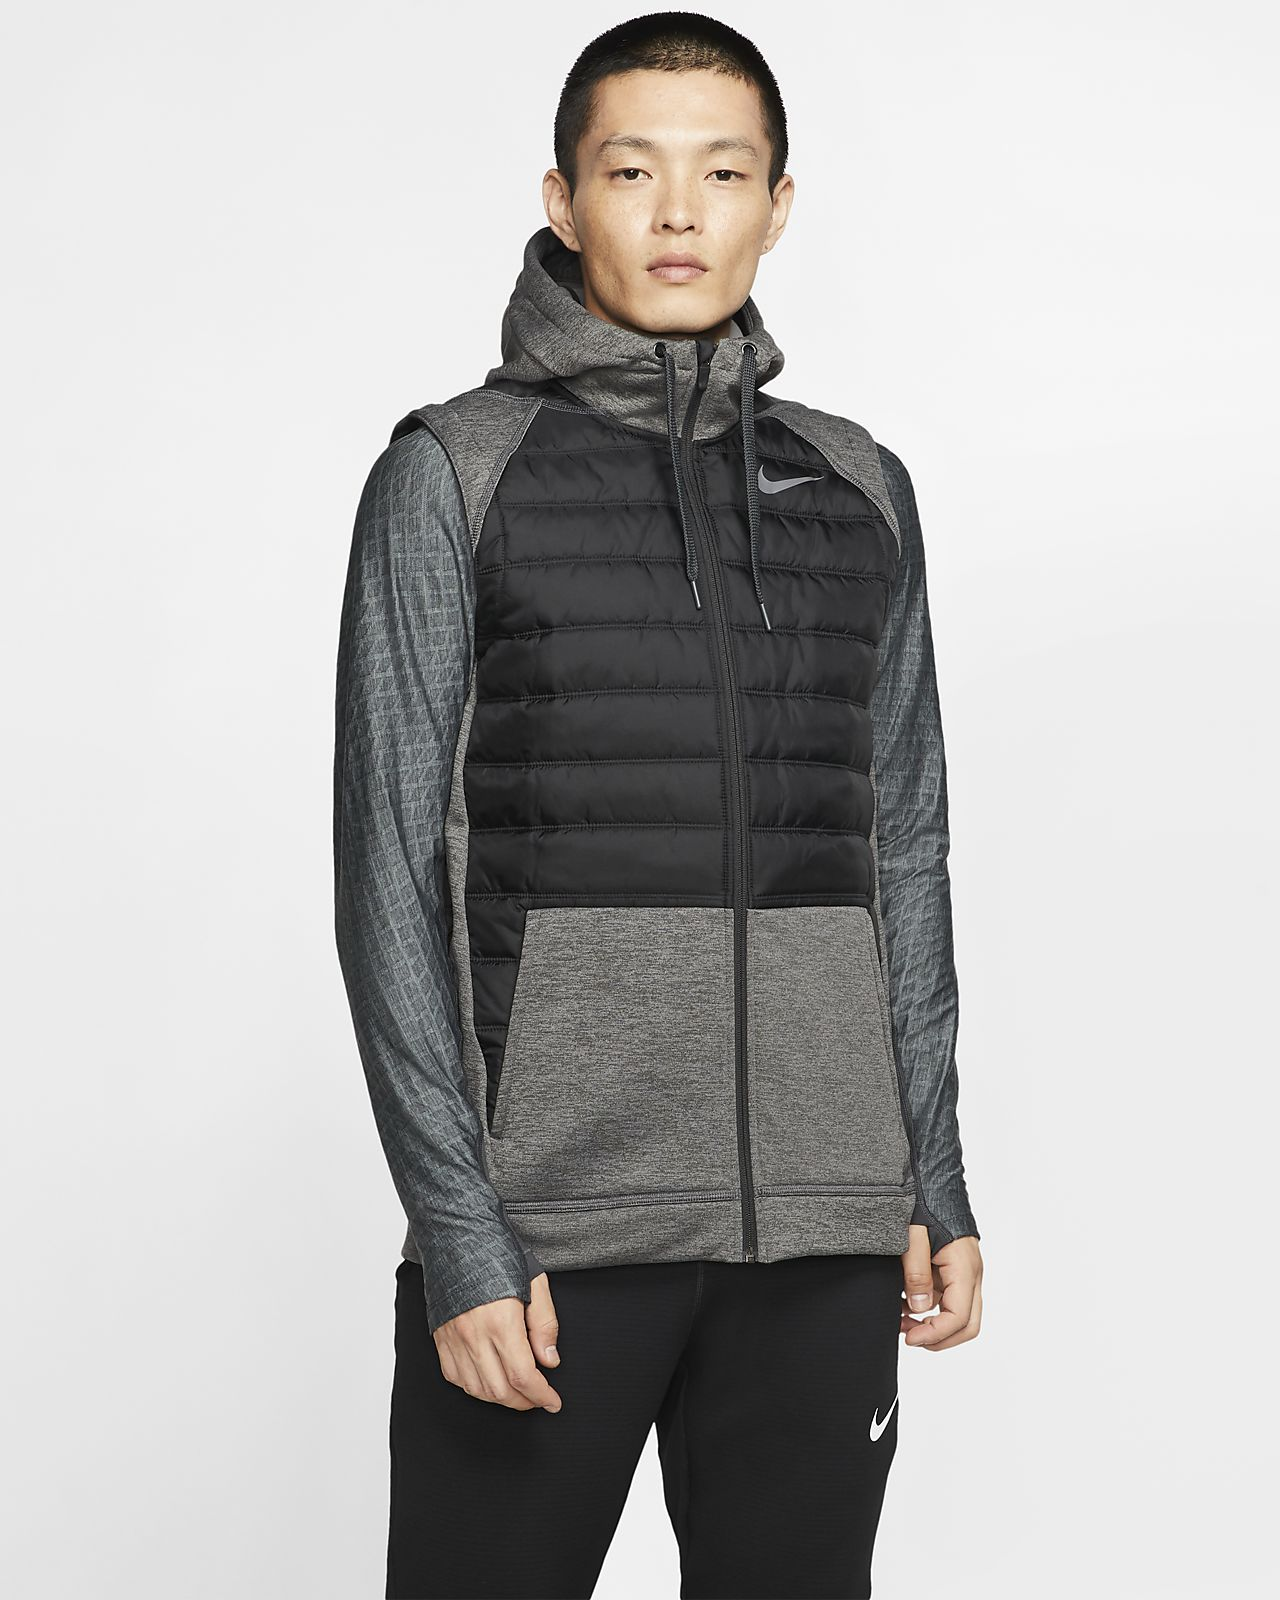 Nike Therma Men's Winterized Full-Zip Training Gilet